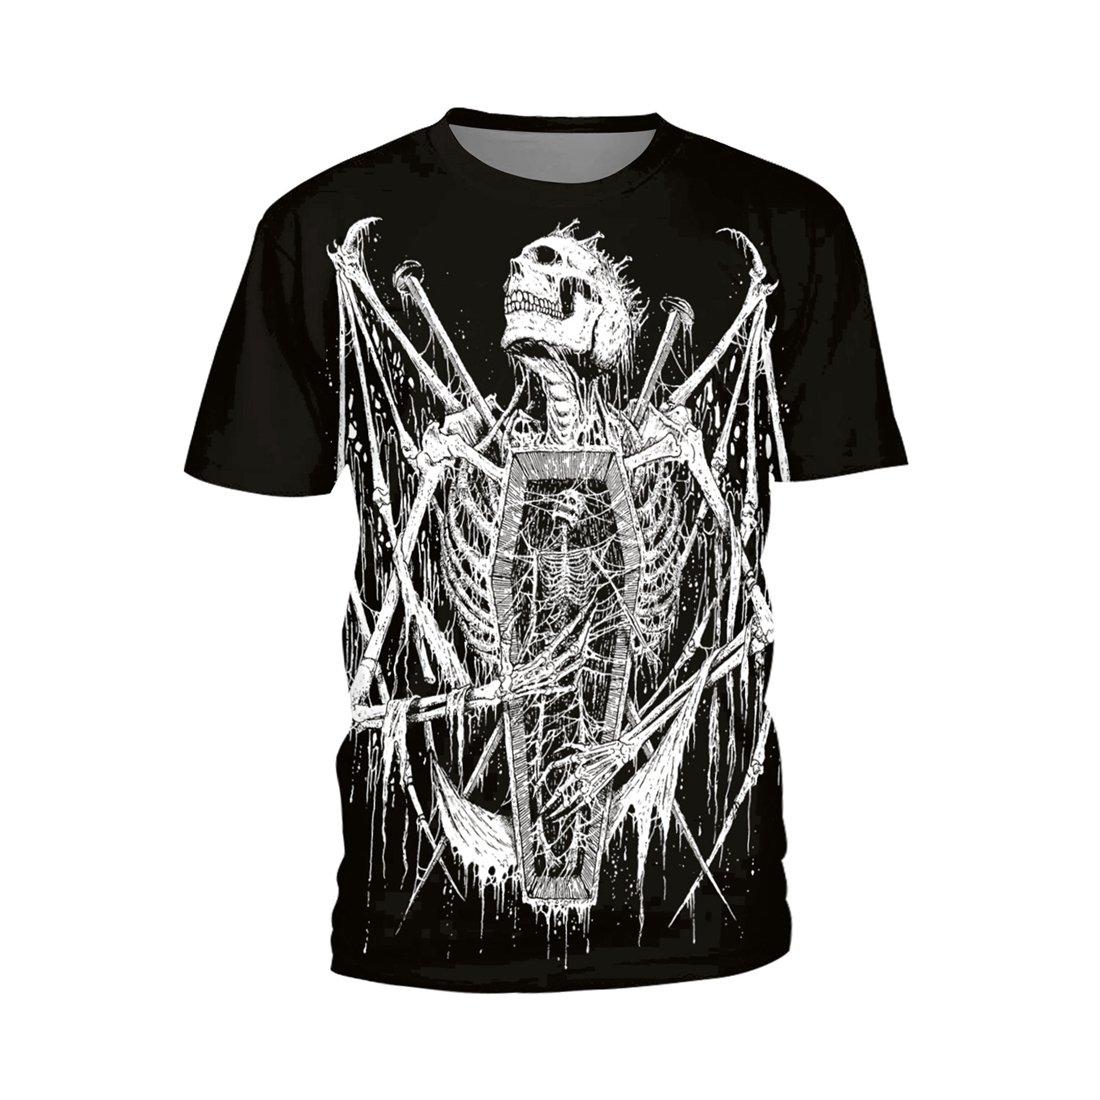 SEVENWELL Unisex Casual T-Shirt Fashion Short Sleeve Loose Fine T-Shirt Popular Skull Pattern XL Death